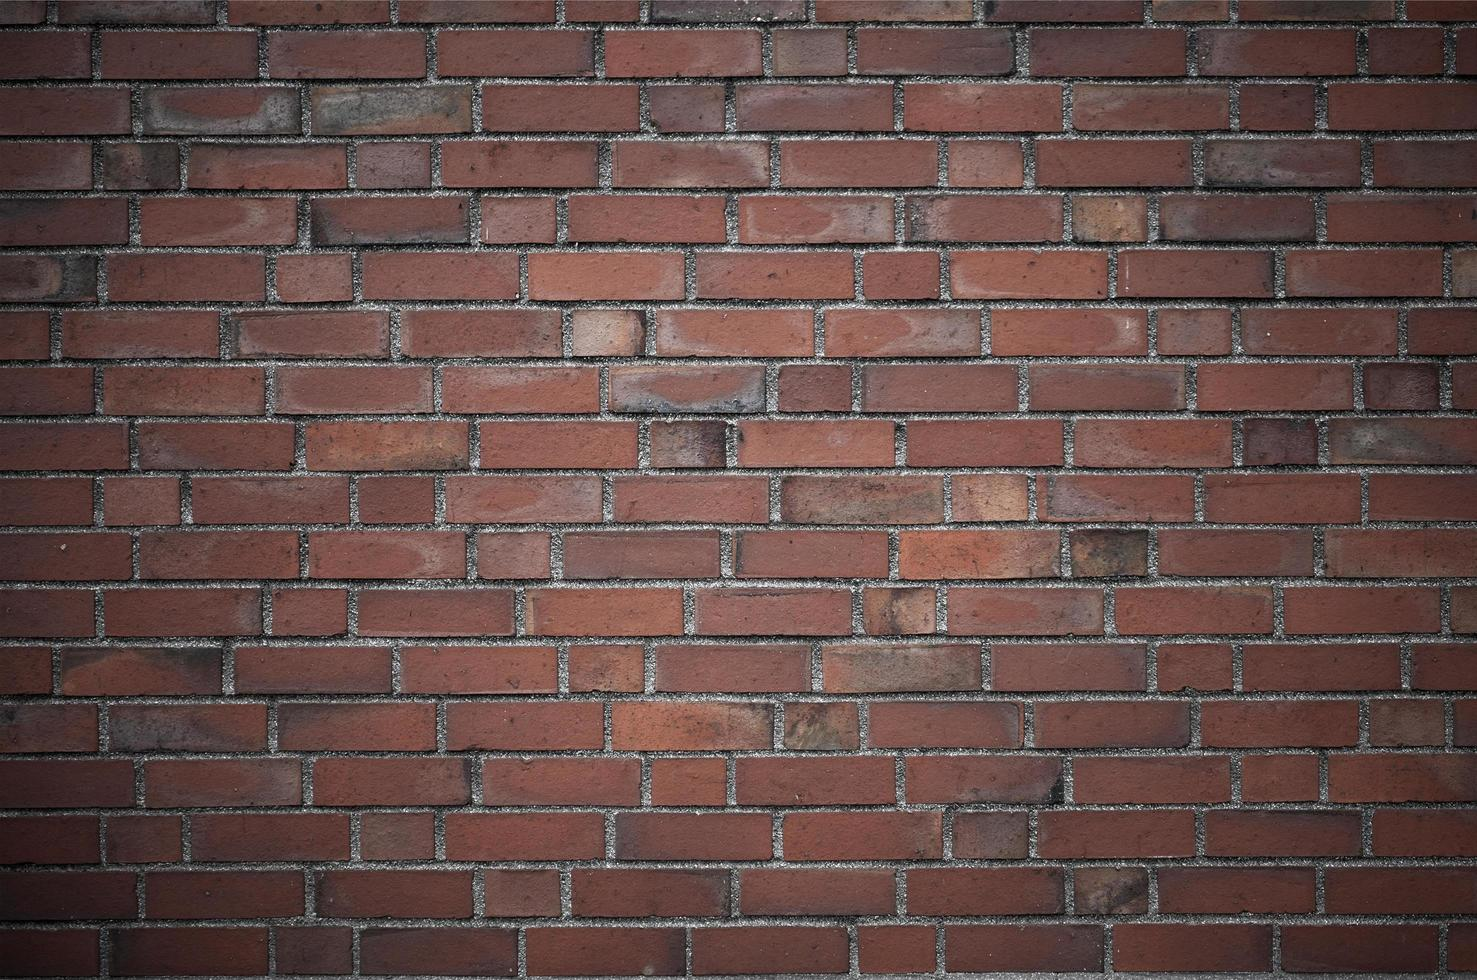 Grunge Stone Brick Wall Background Texture photo